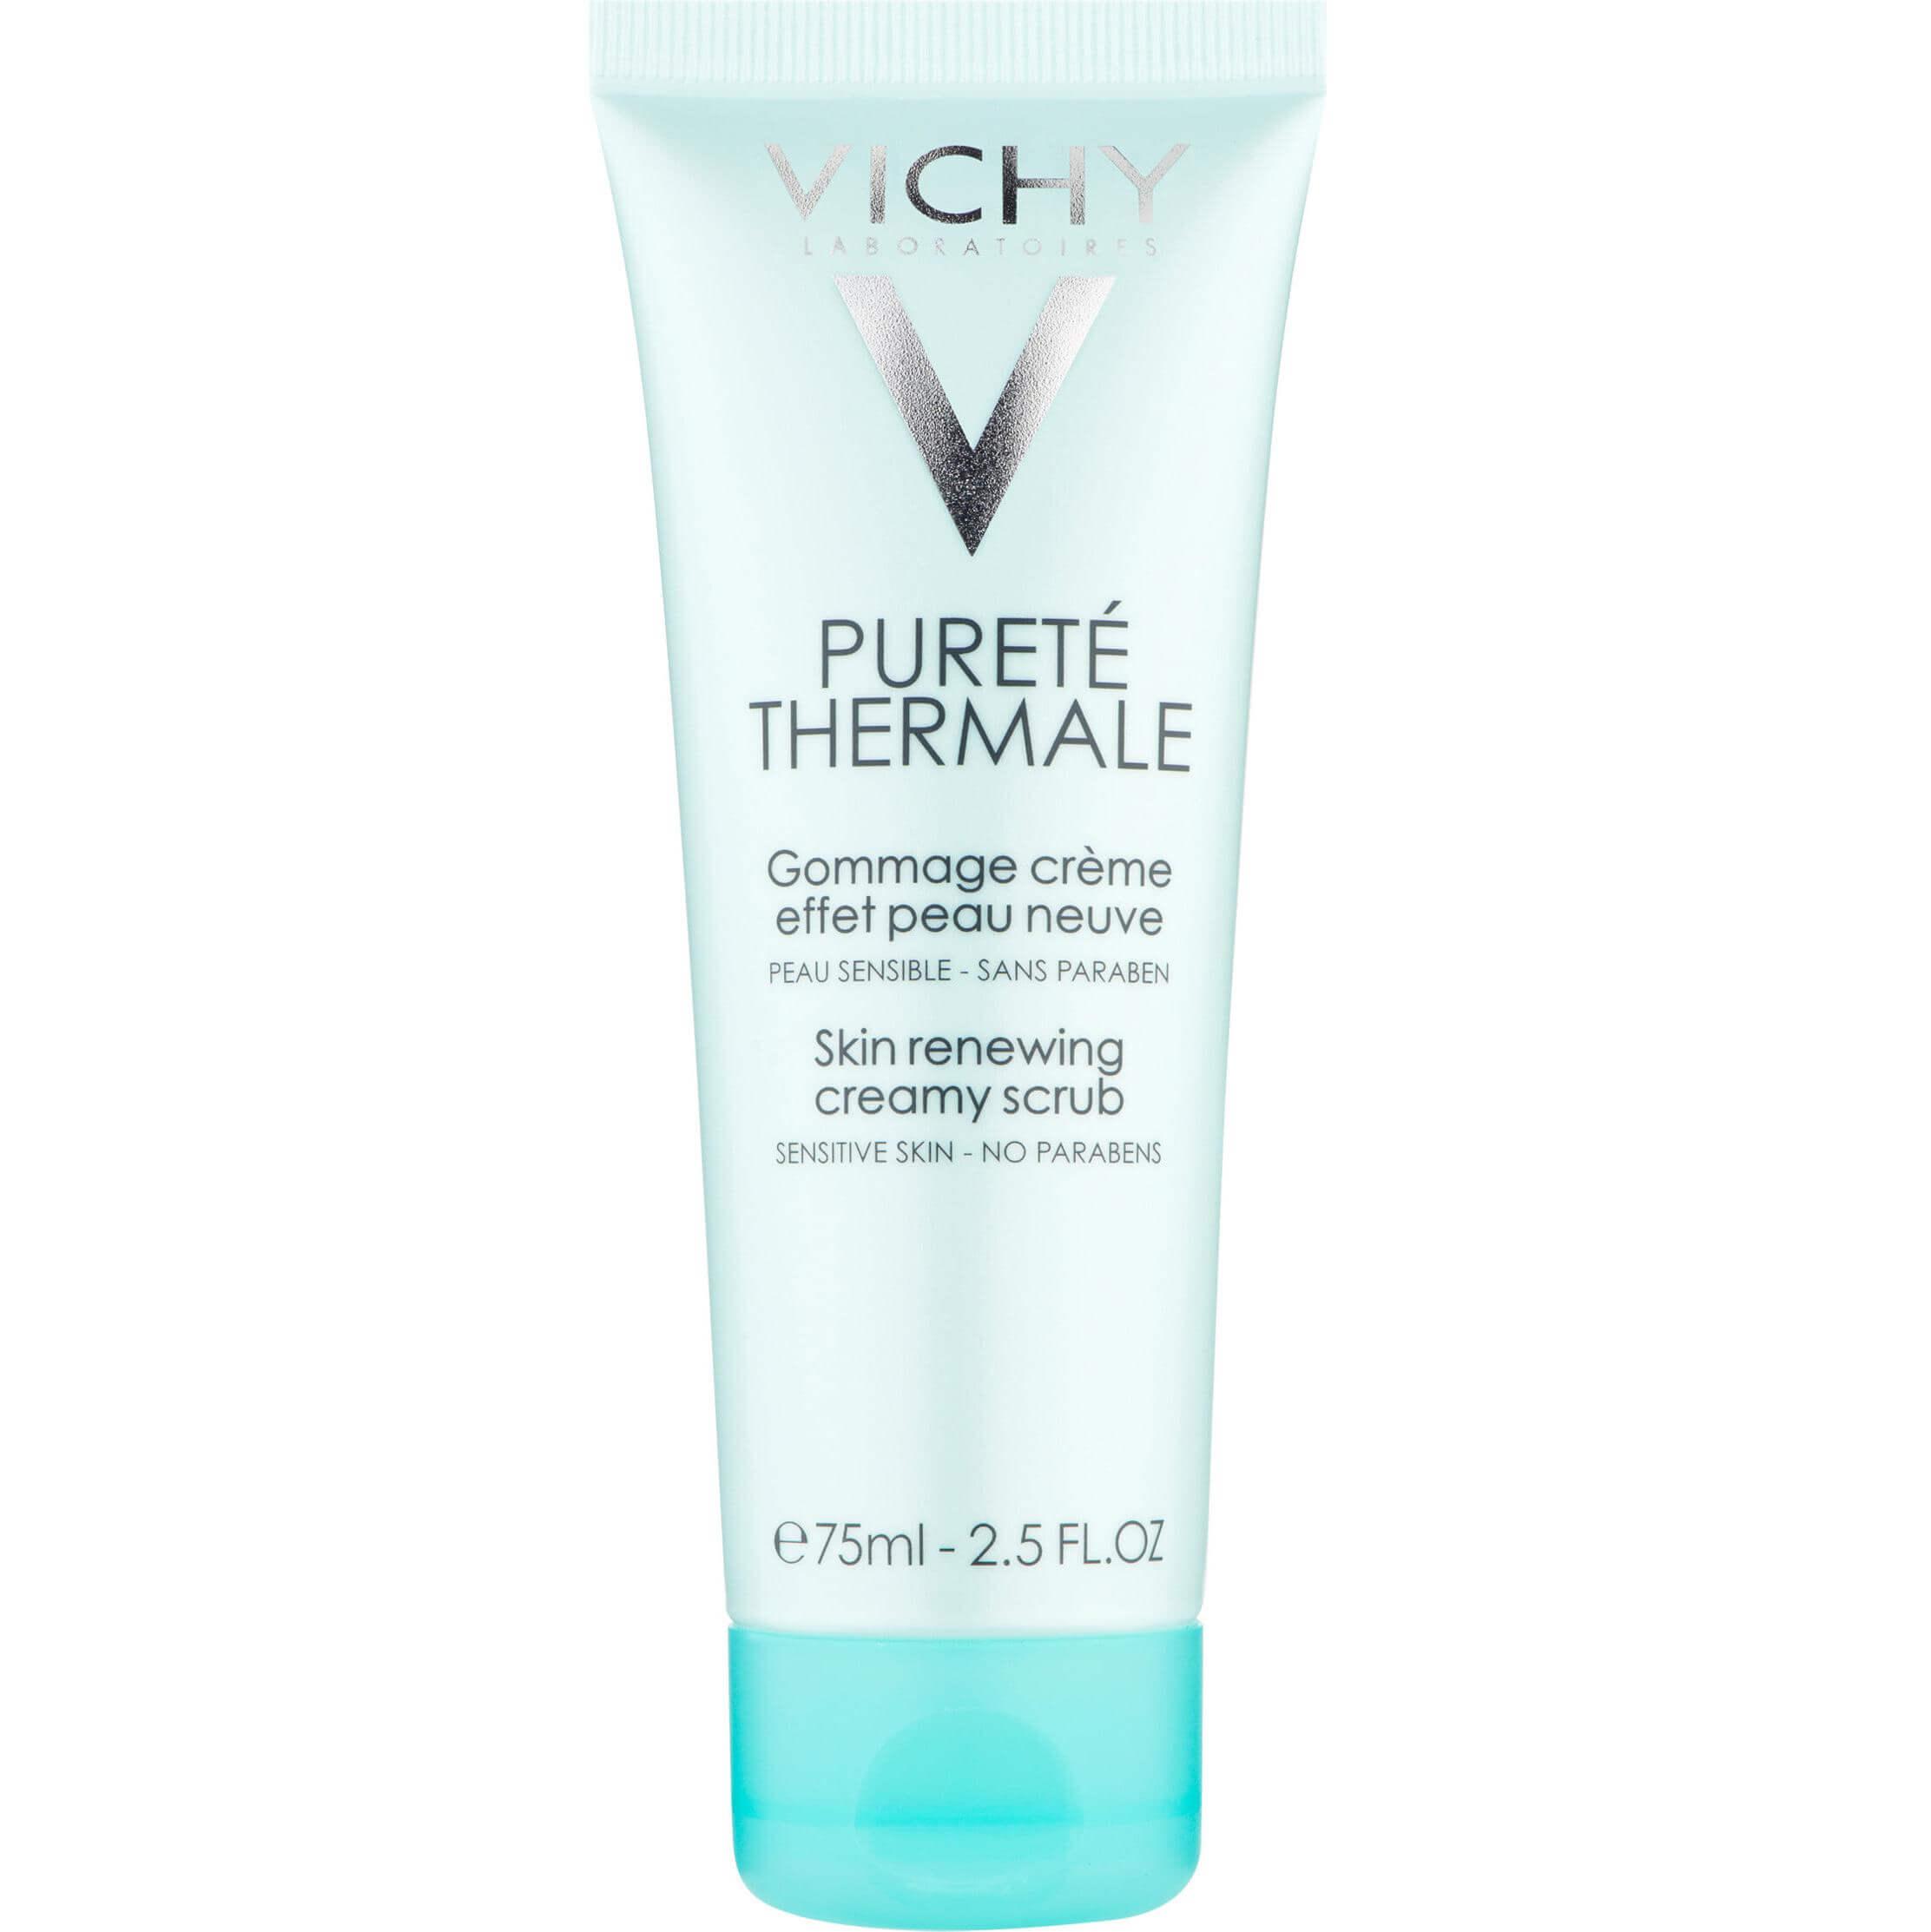 Vichy Purete Thermale Exfoliant Creme Κρέμα Απολέπισης 75ml